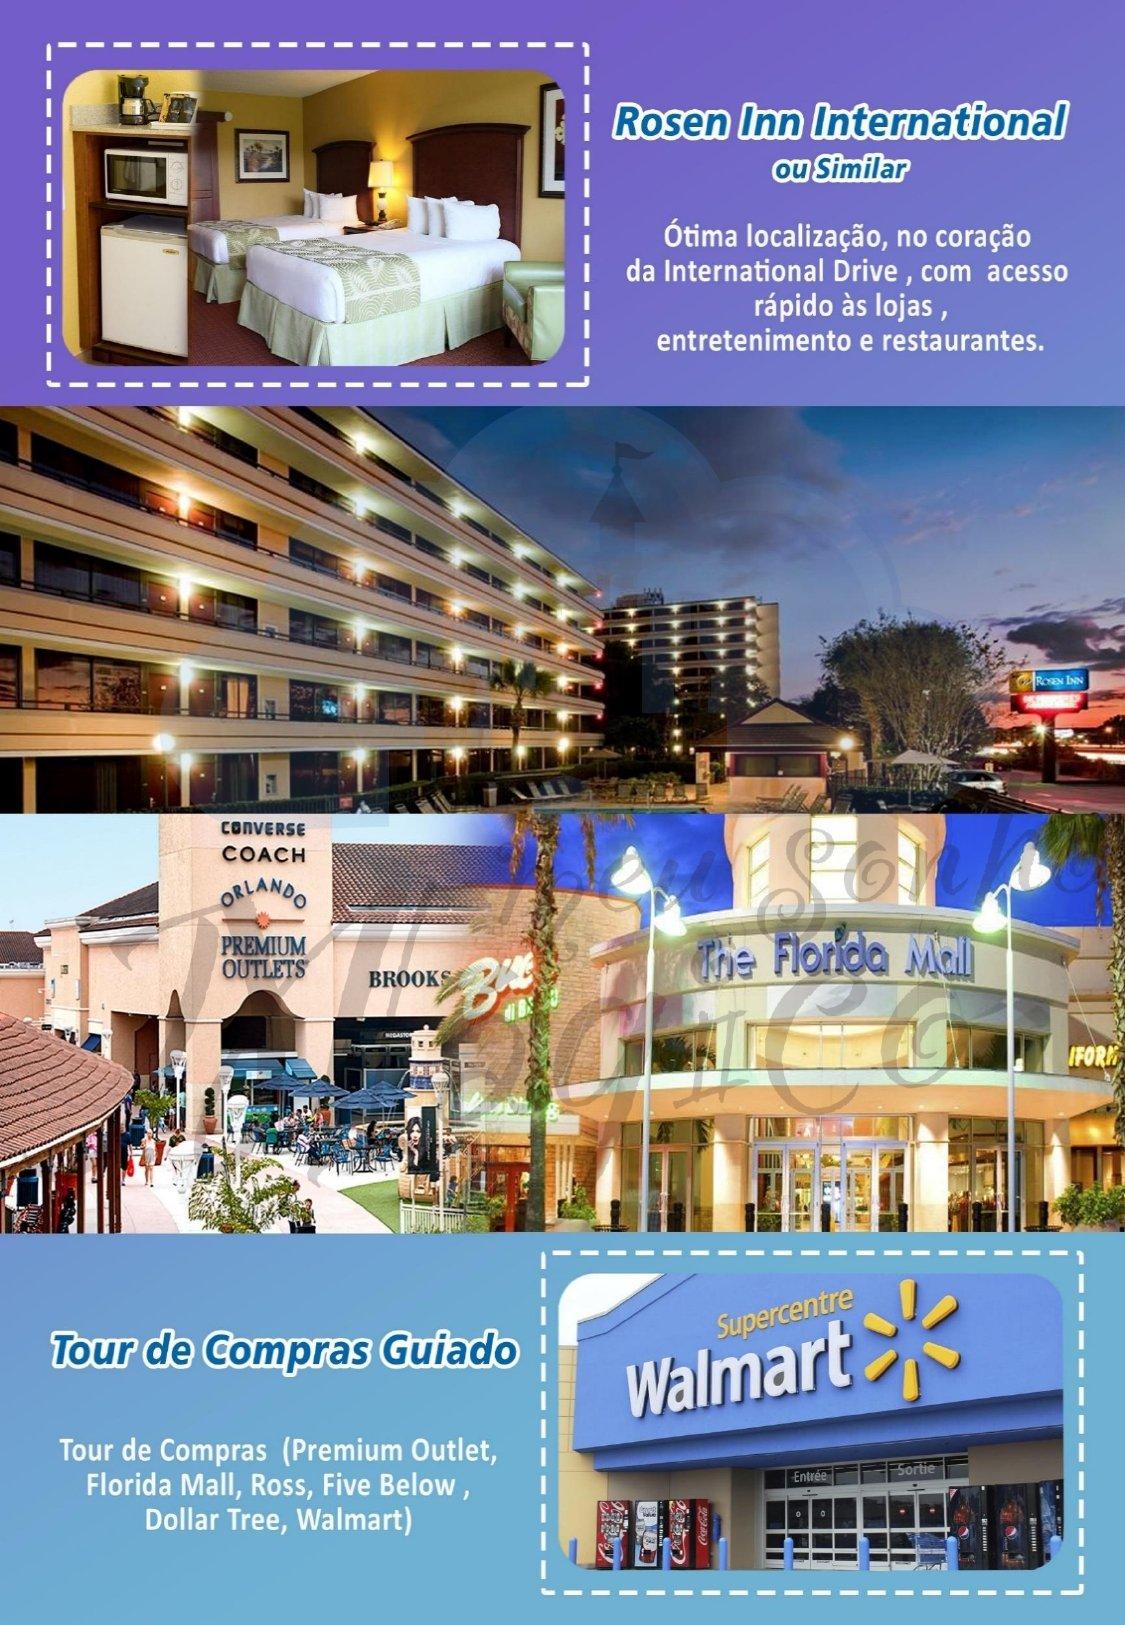 Grupo Family Natal - Disney Novembro 2022 2